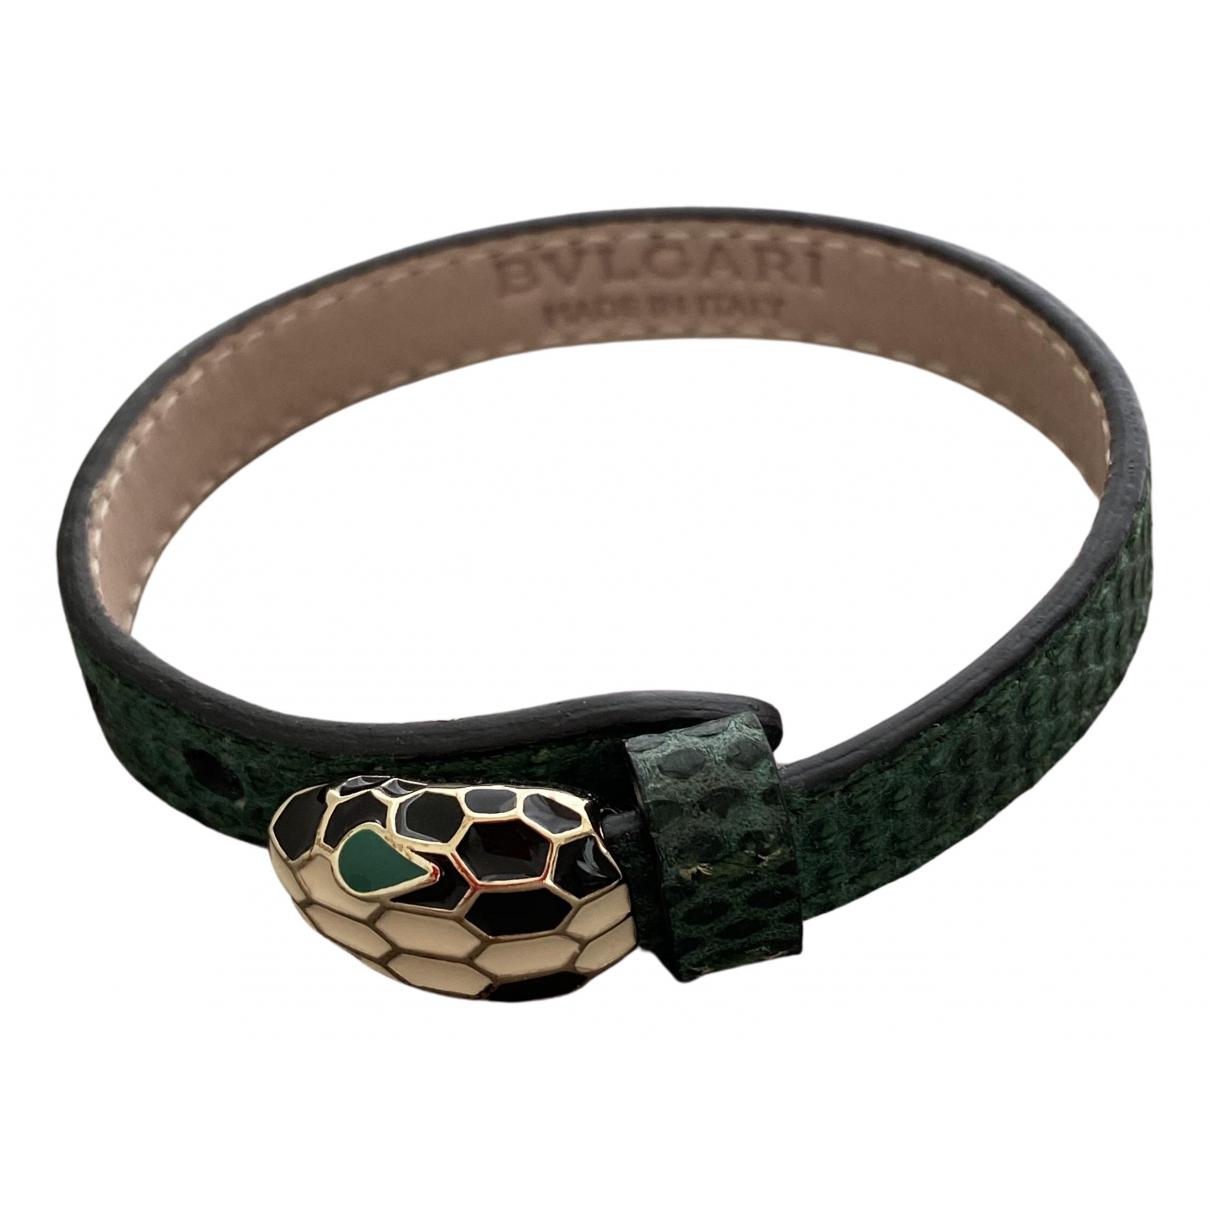 Bvlgari Serpenti Armband in  Gruen Leder